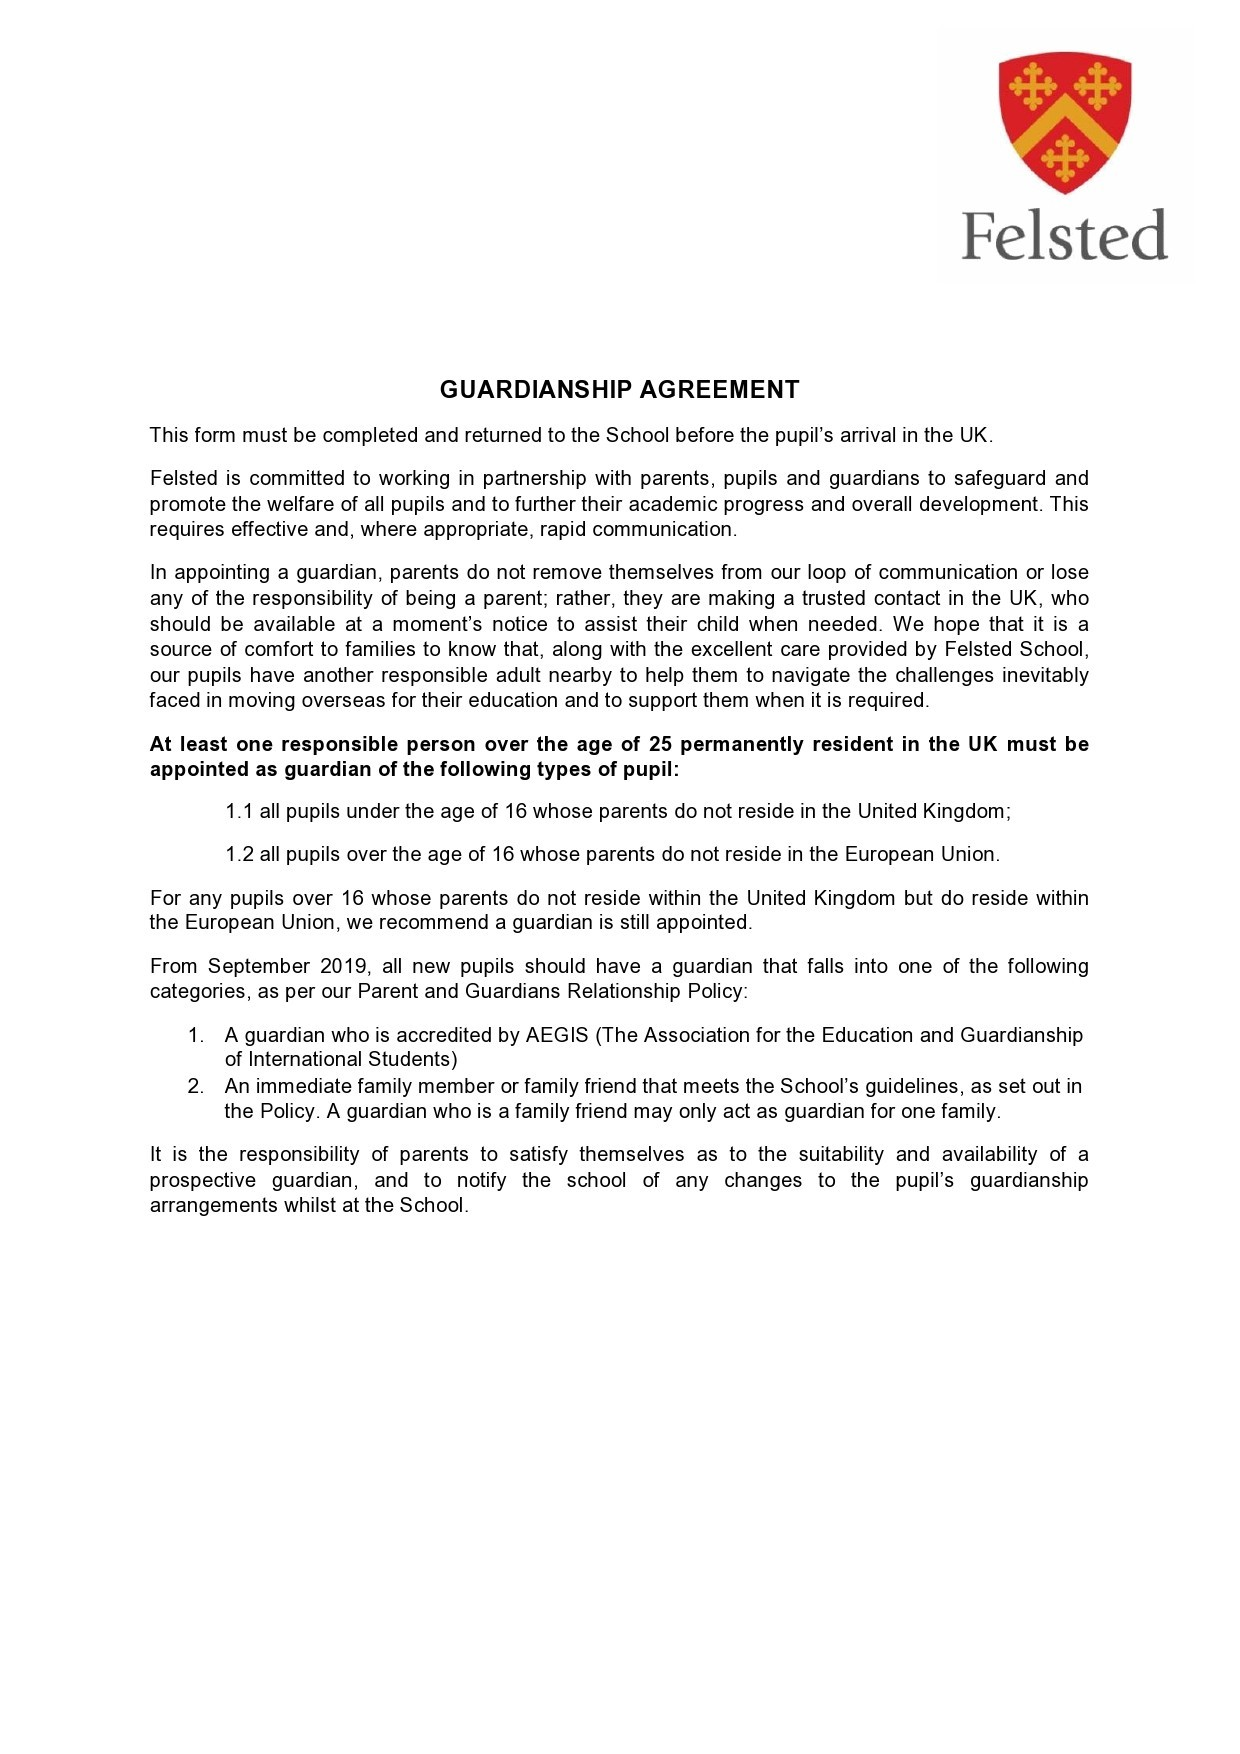 Free guardianship form 47